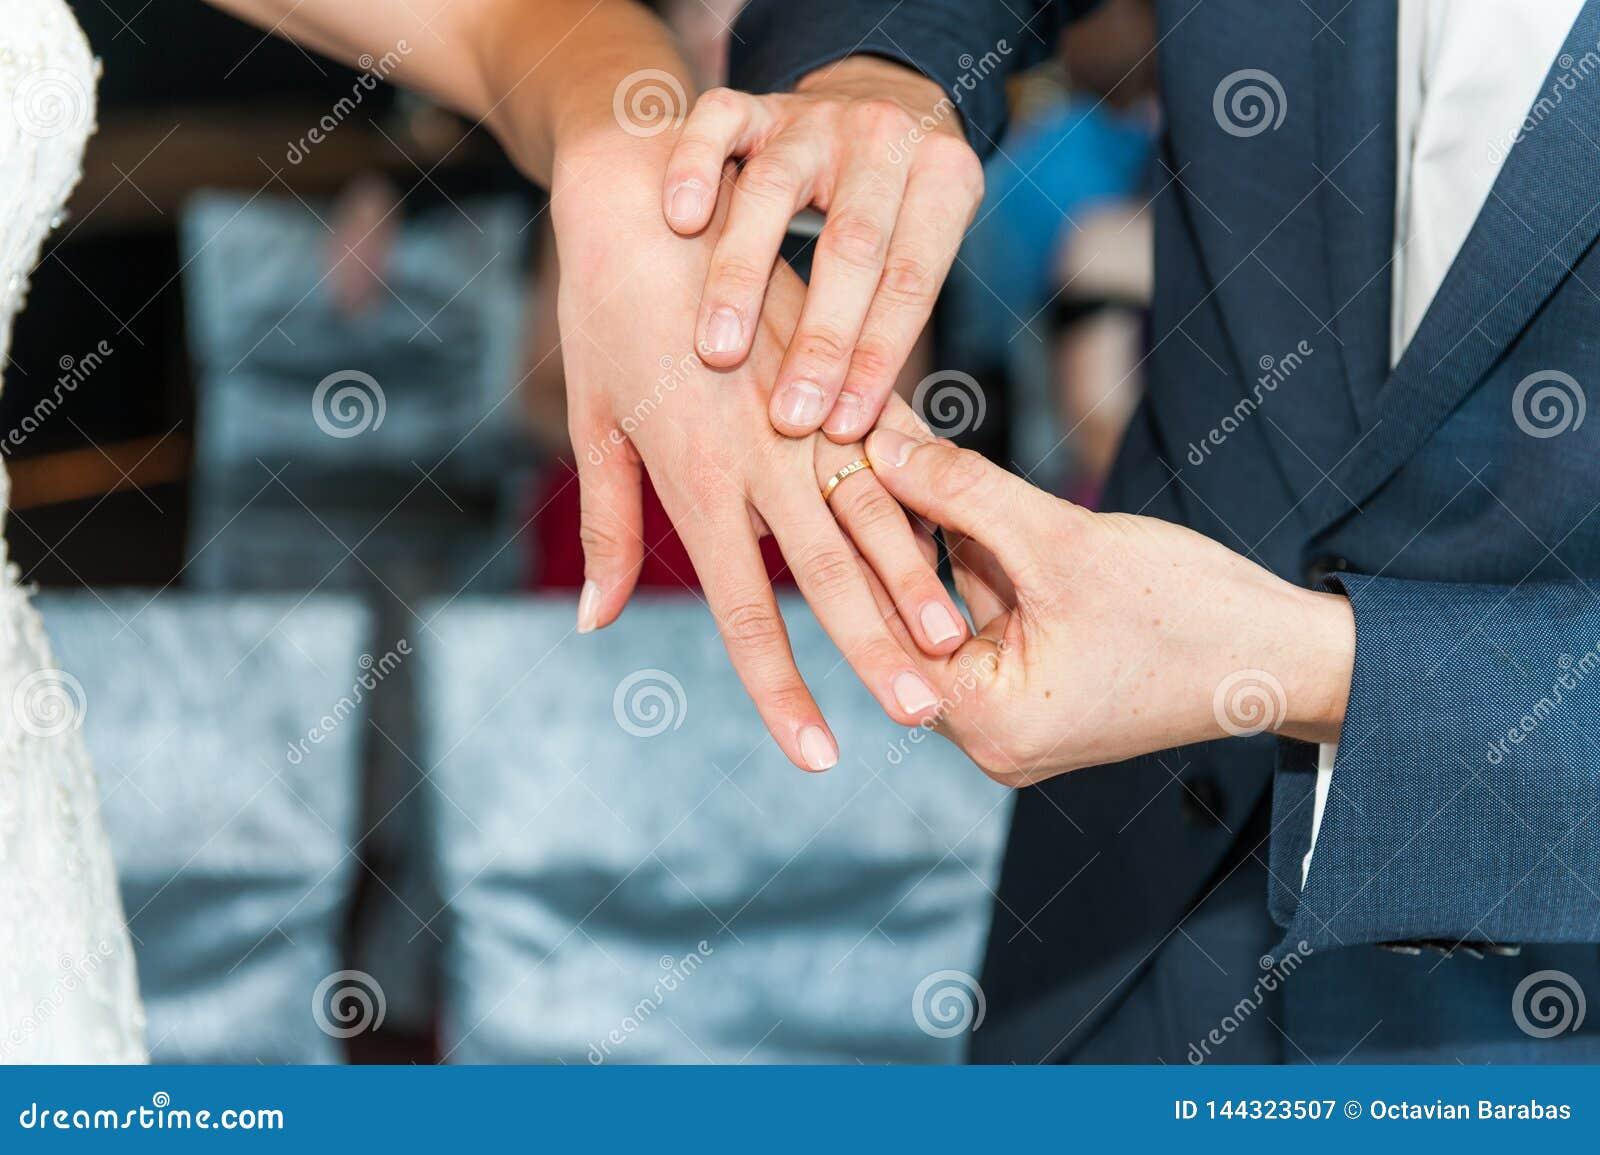 Wedding rings on hands of newlyweds